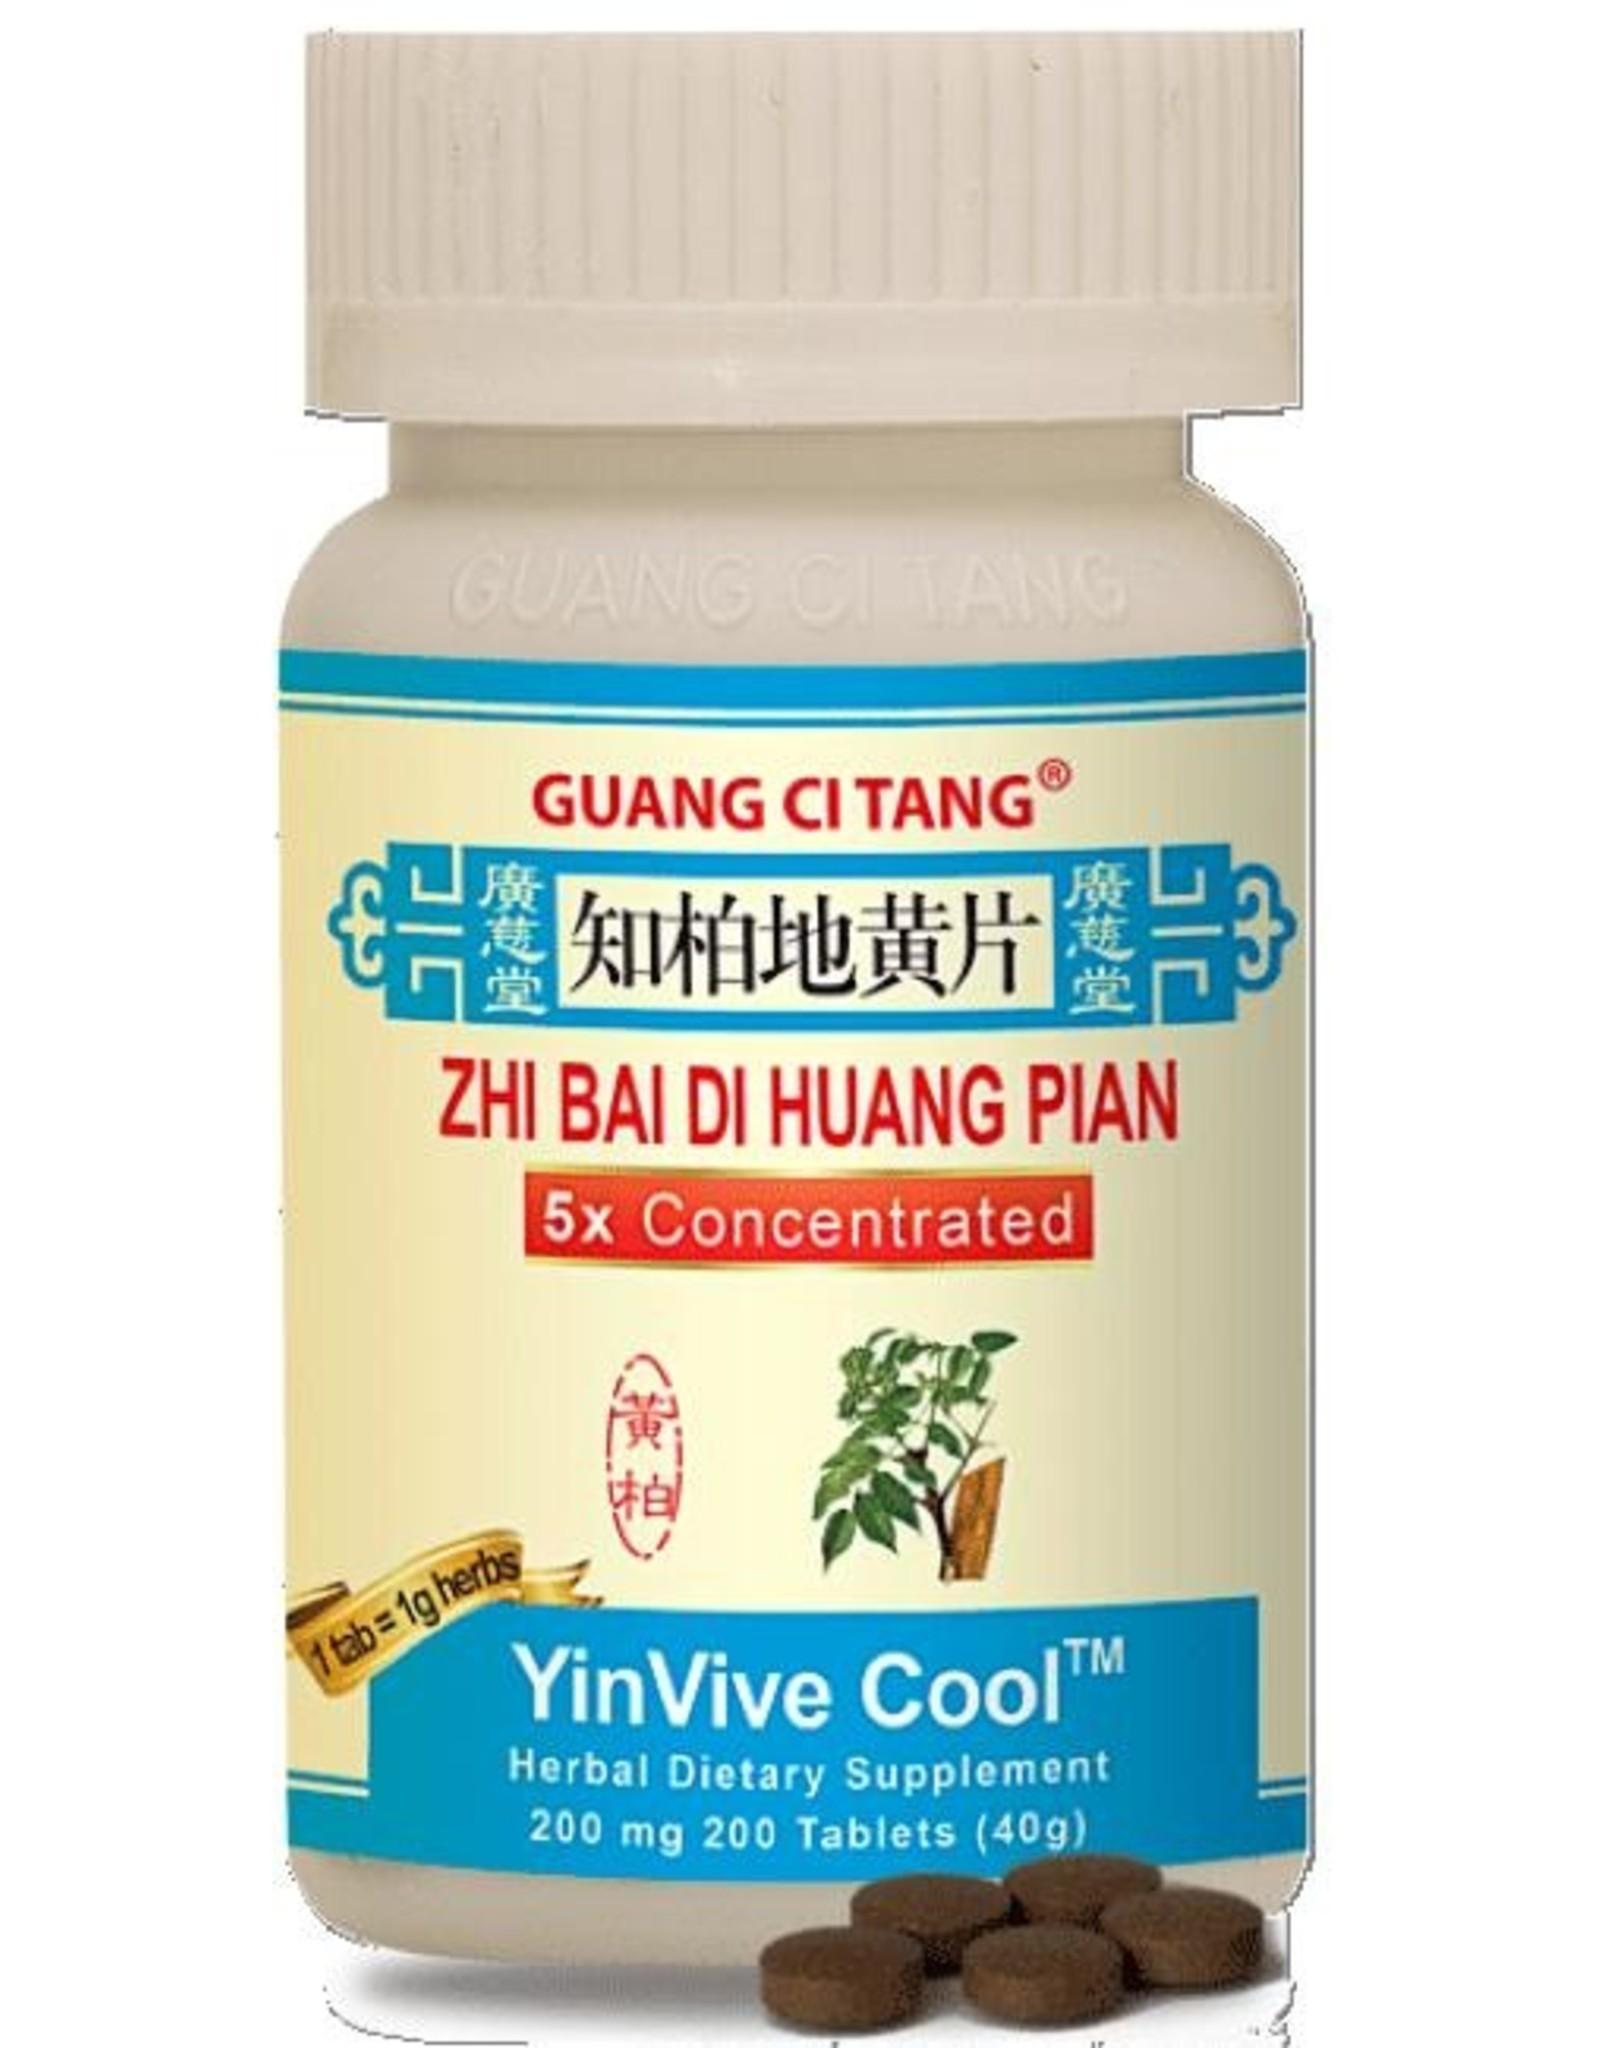 ActiveHerb YinVive Cool